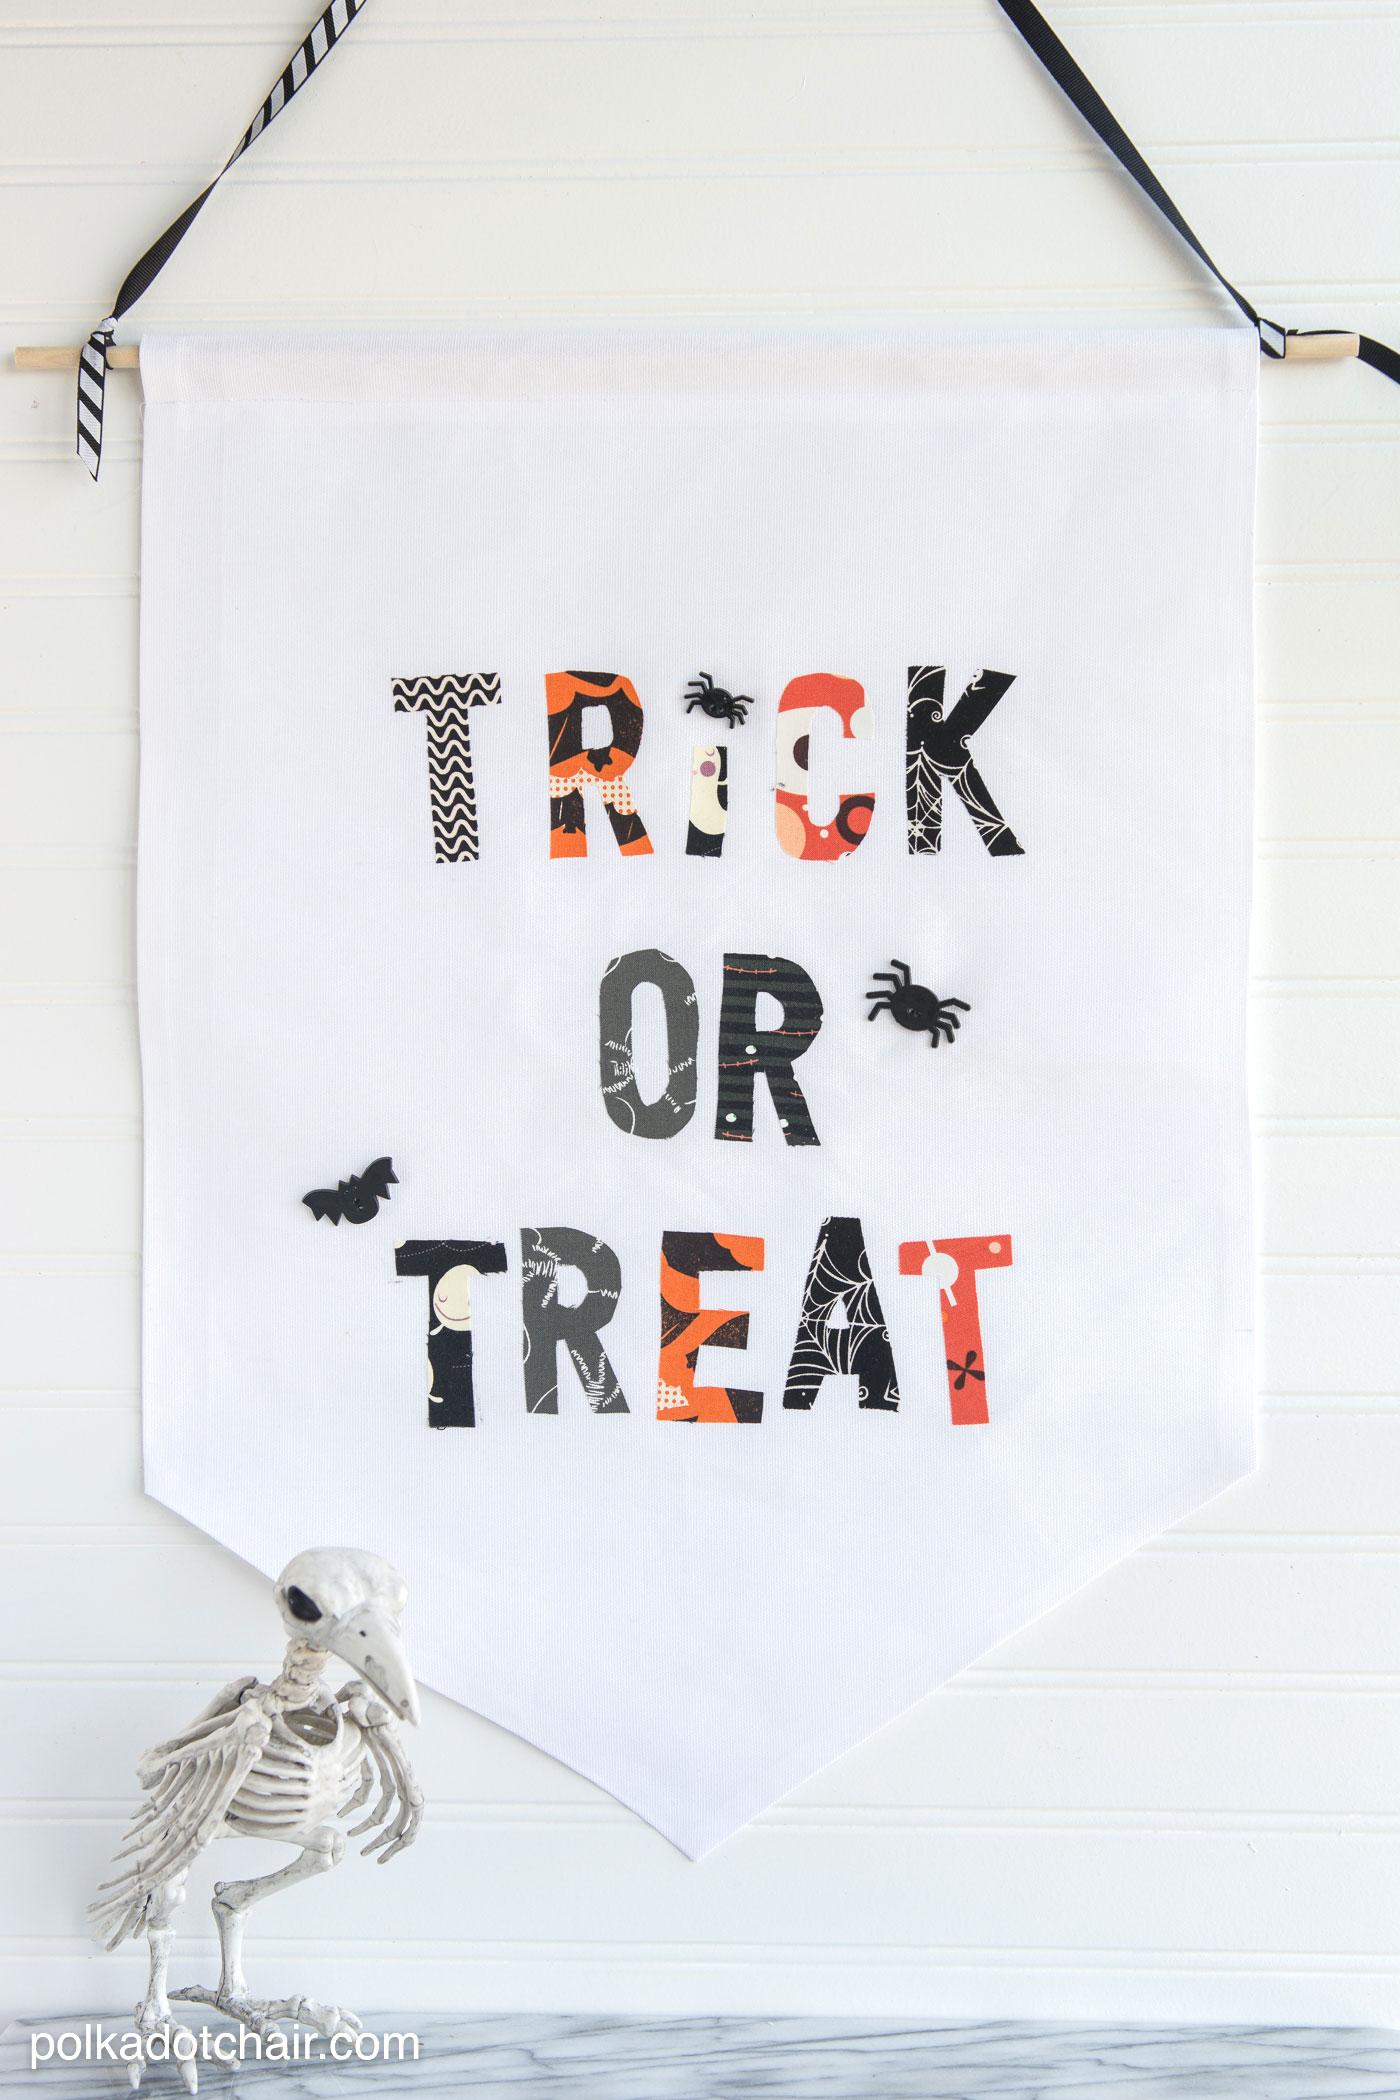 Cute Halloween Trick or Treat Fabric Banner Tutorial by Melissa of polkadotchair.com